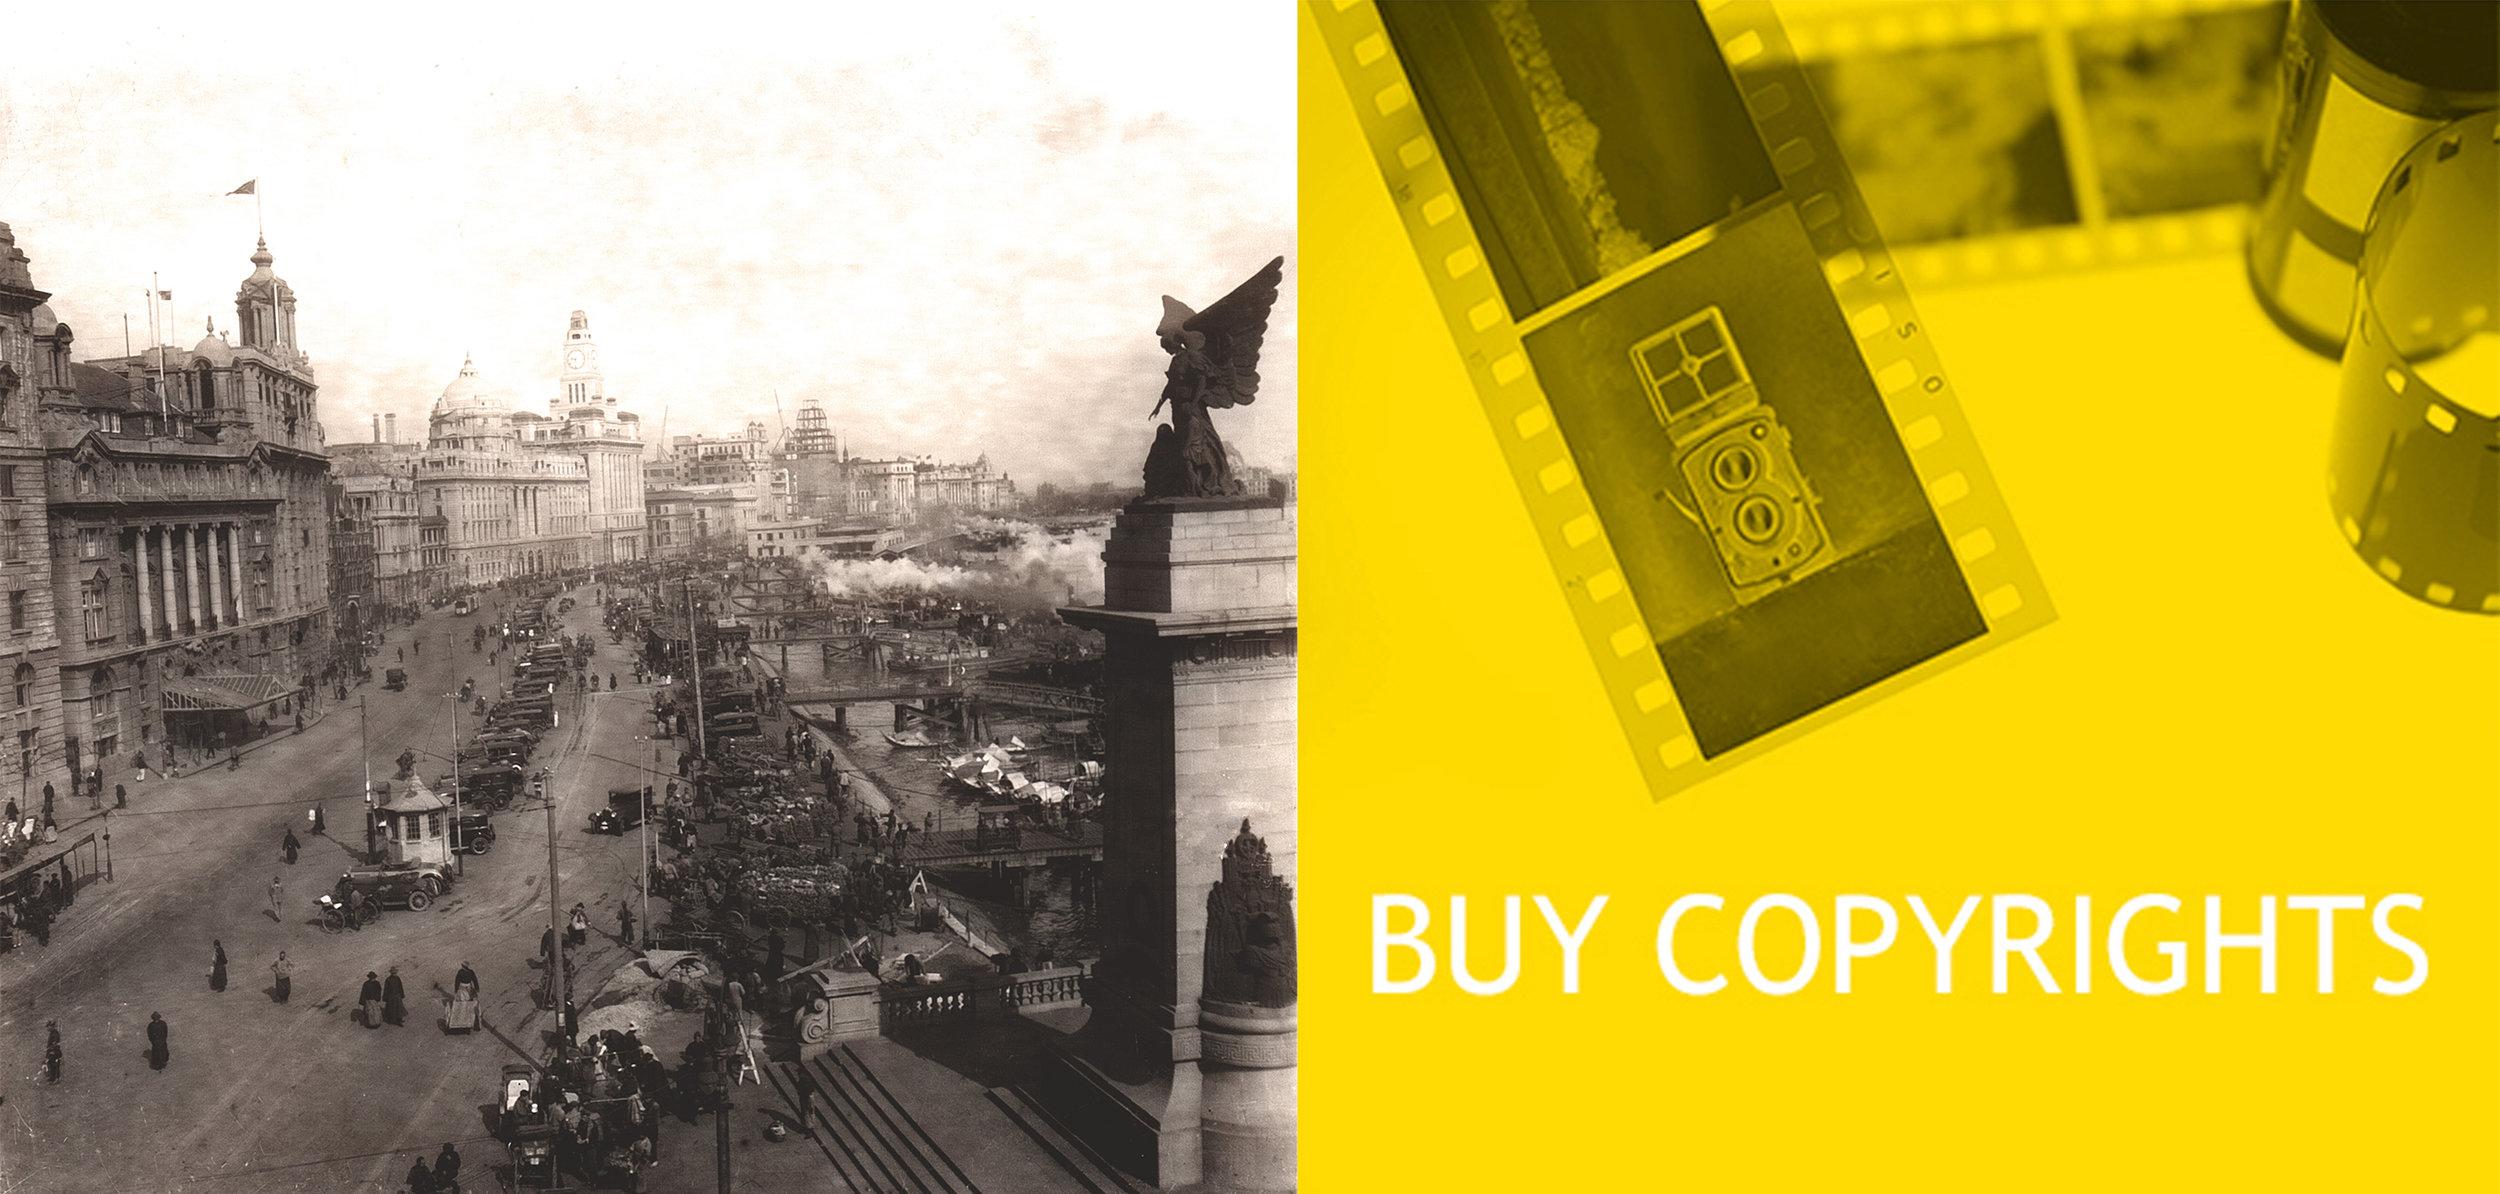 buy-copyrights2017-photography-of-china.jpg